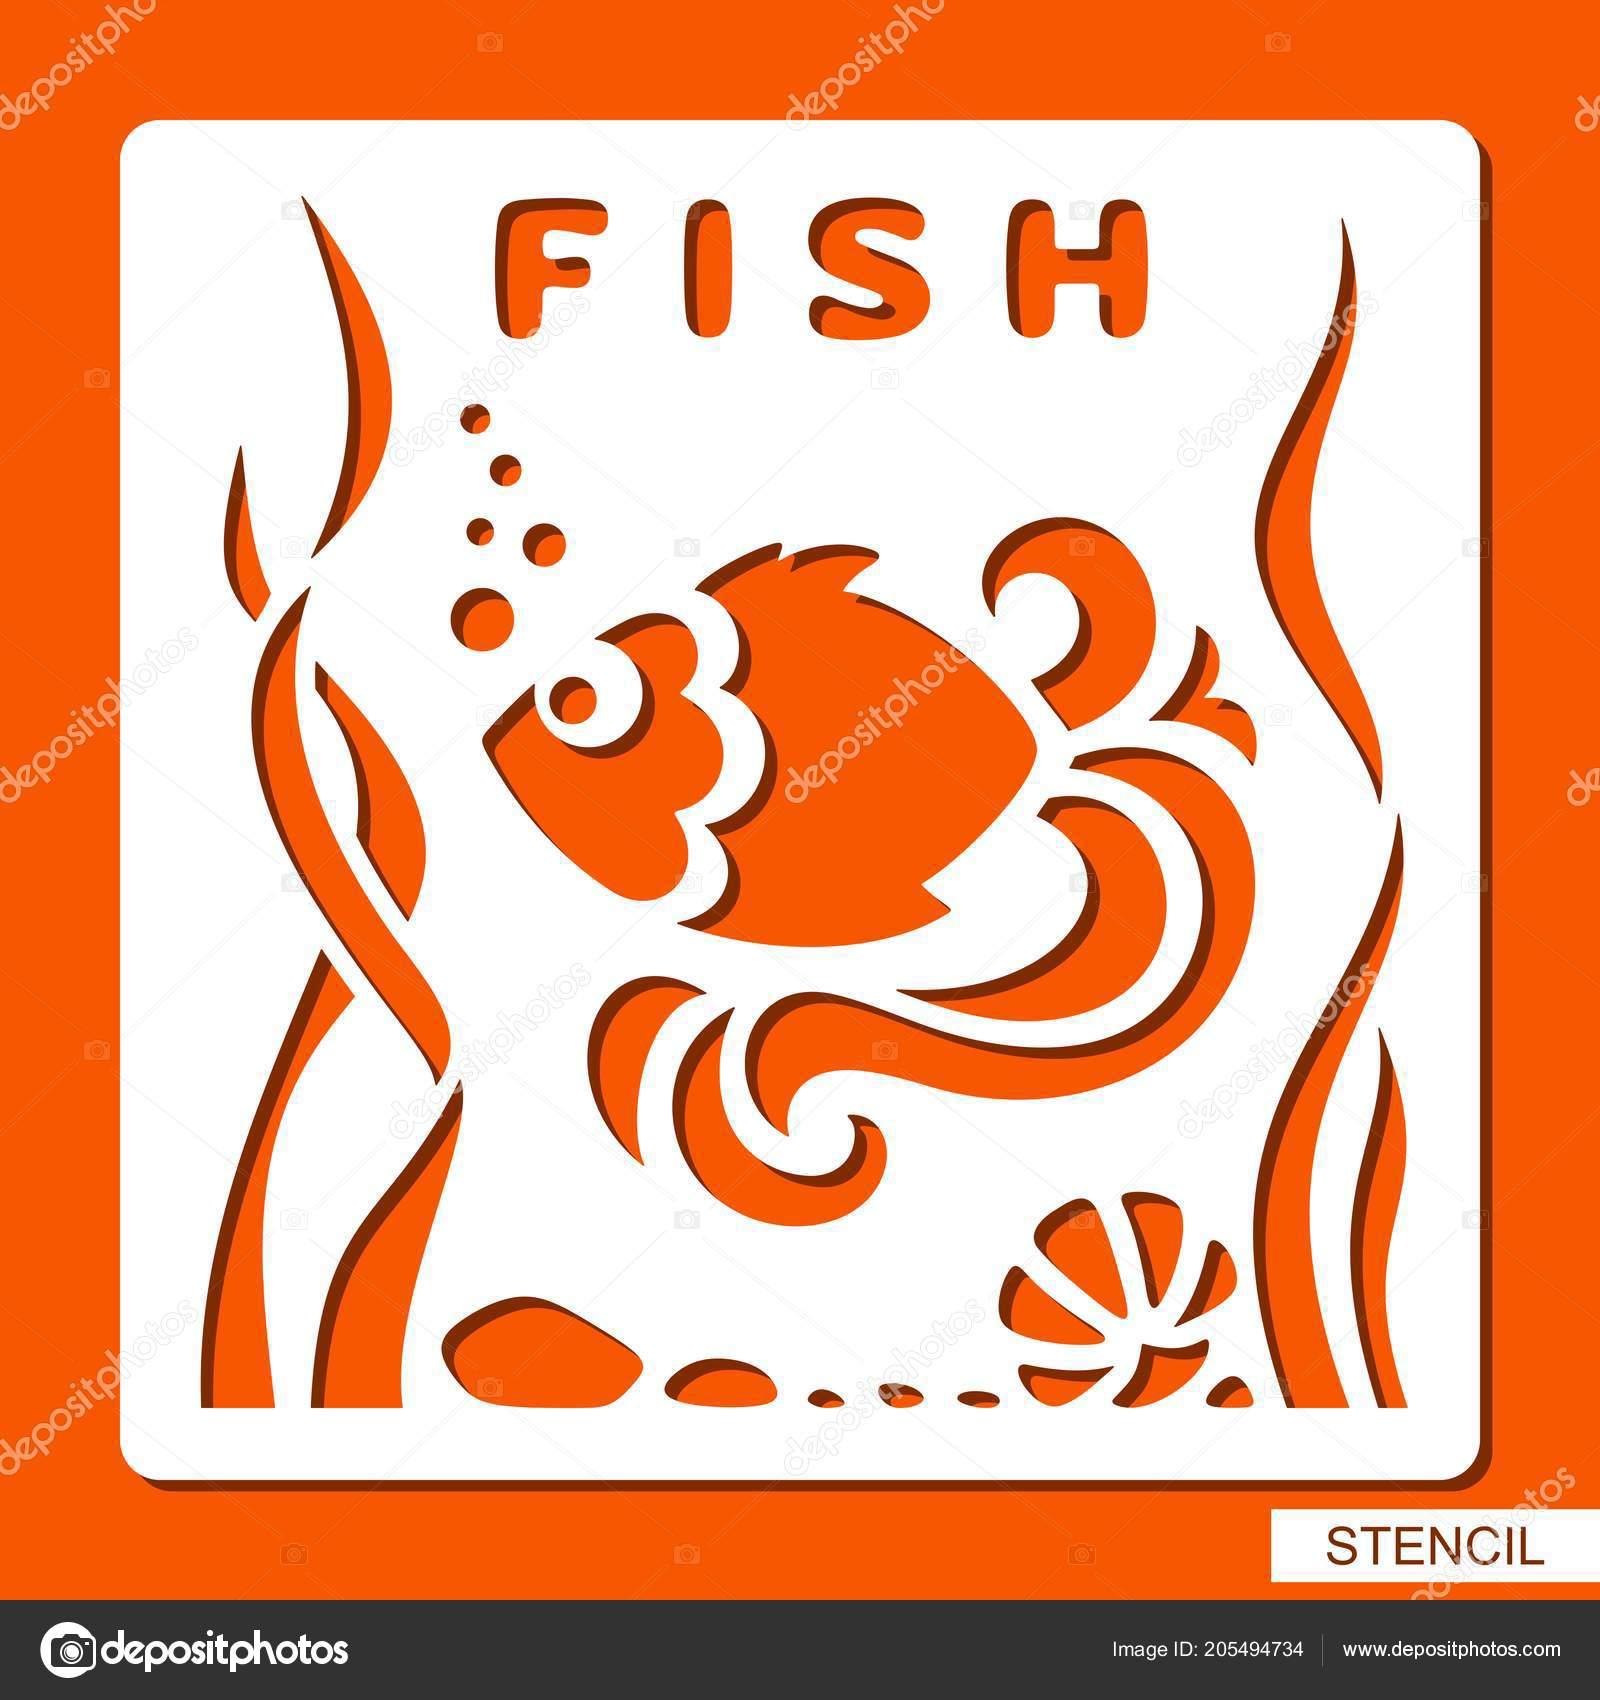 Stencil Children Fish Seaweed Stones Shell Template Laser